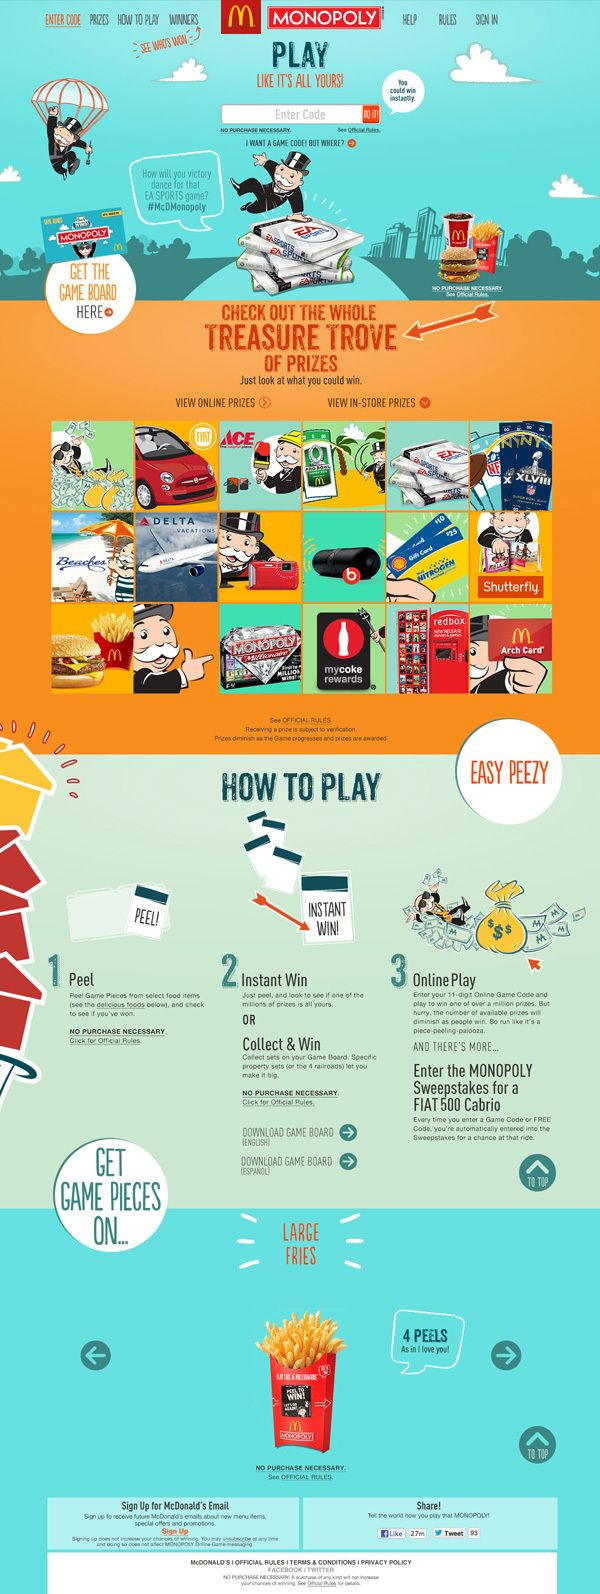 McDonald's 2013 Online Monopoly Game on Web Design